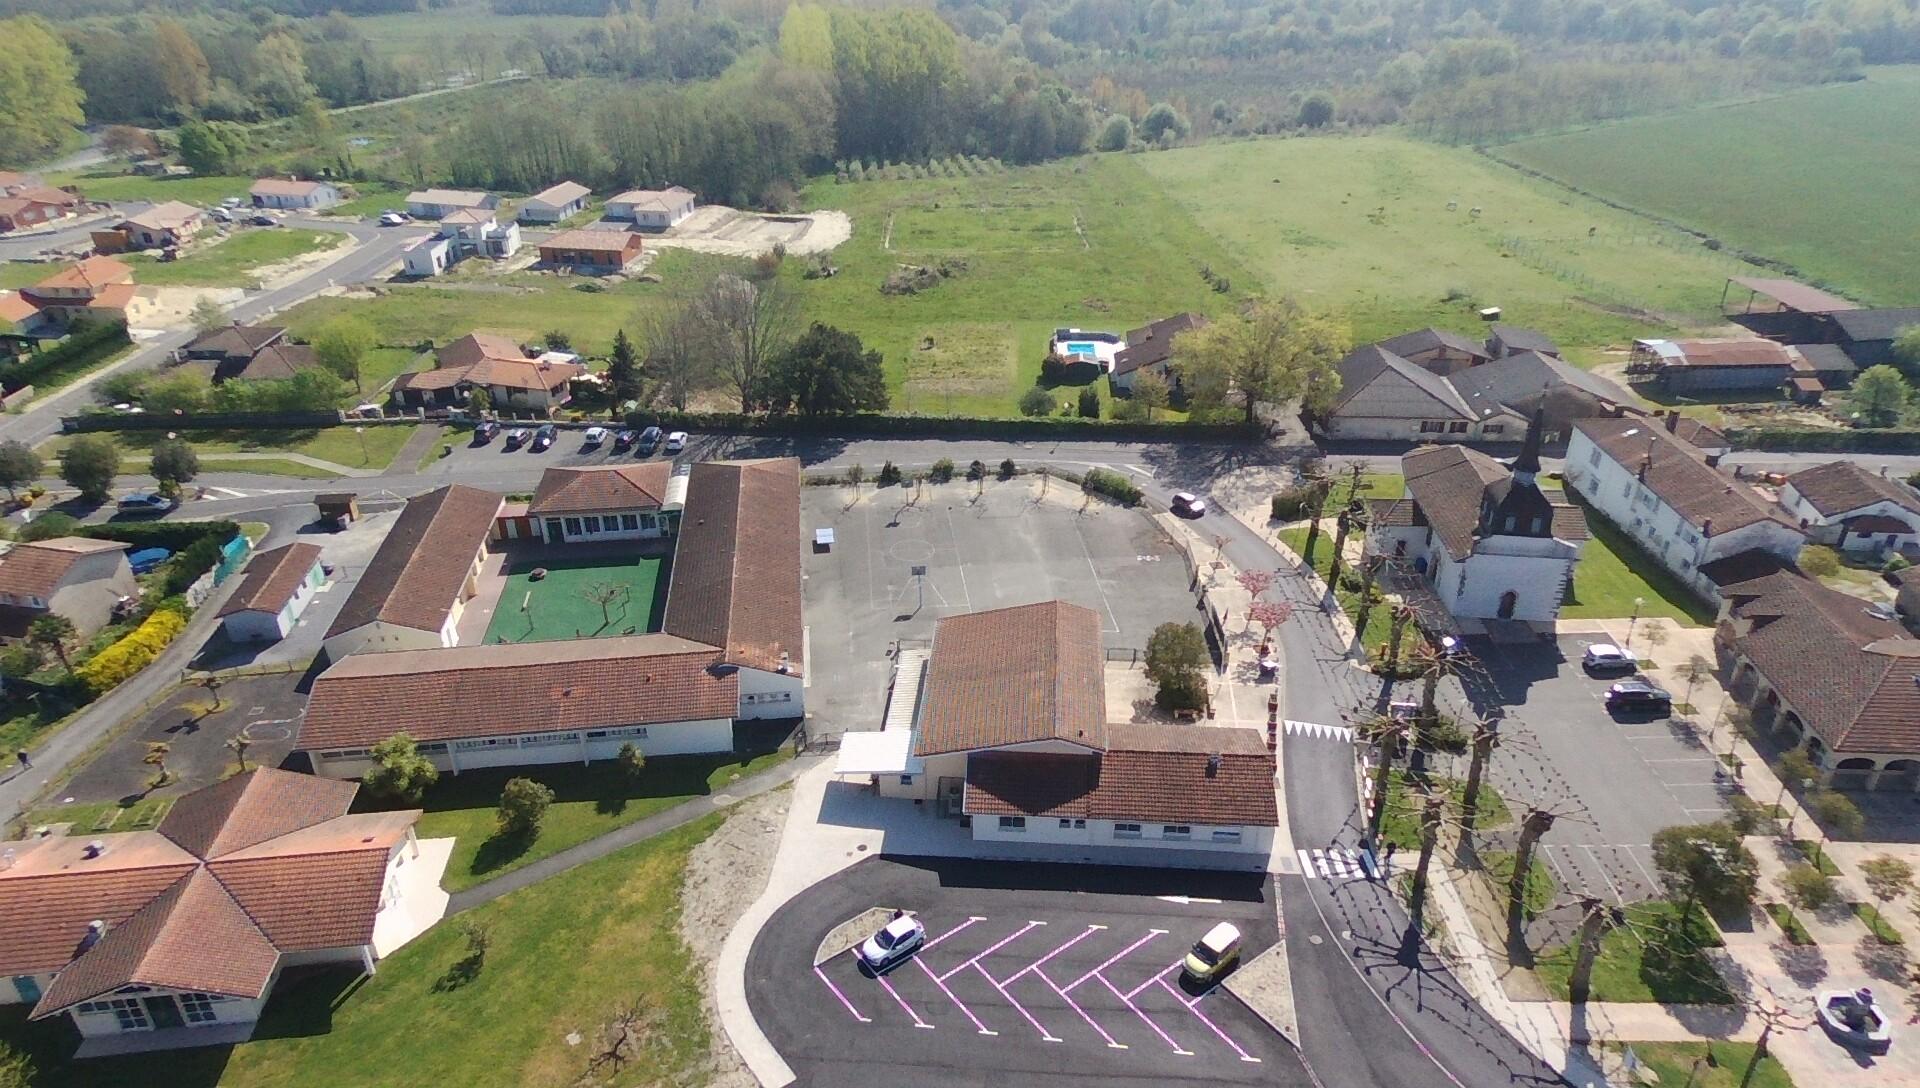 drone centre village 2.jpg